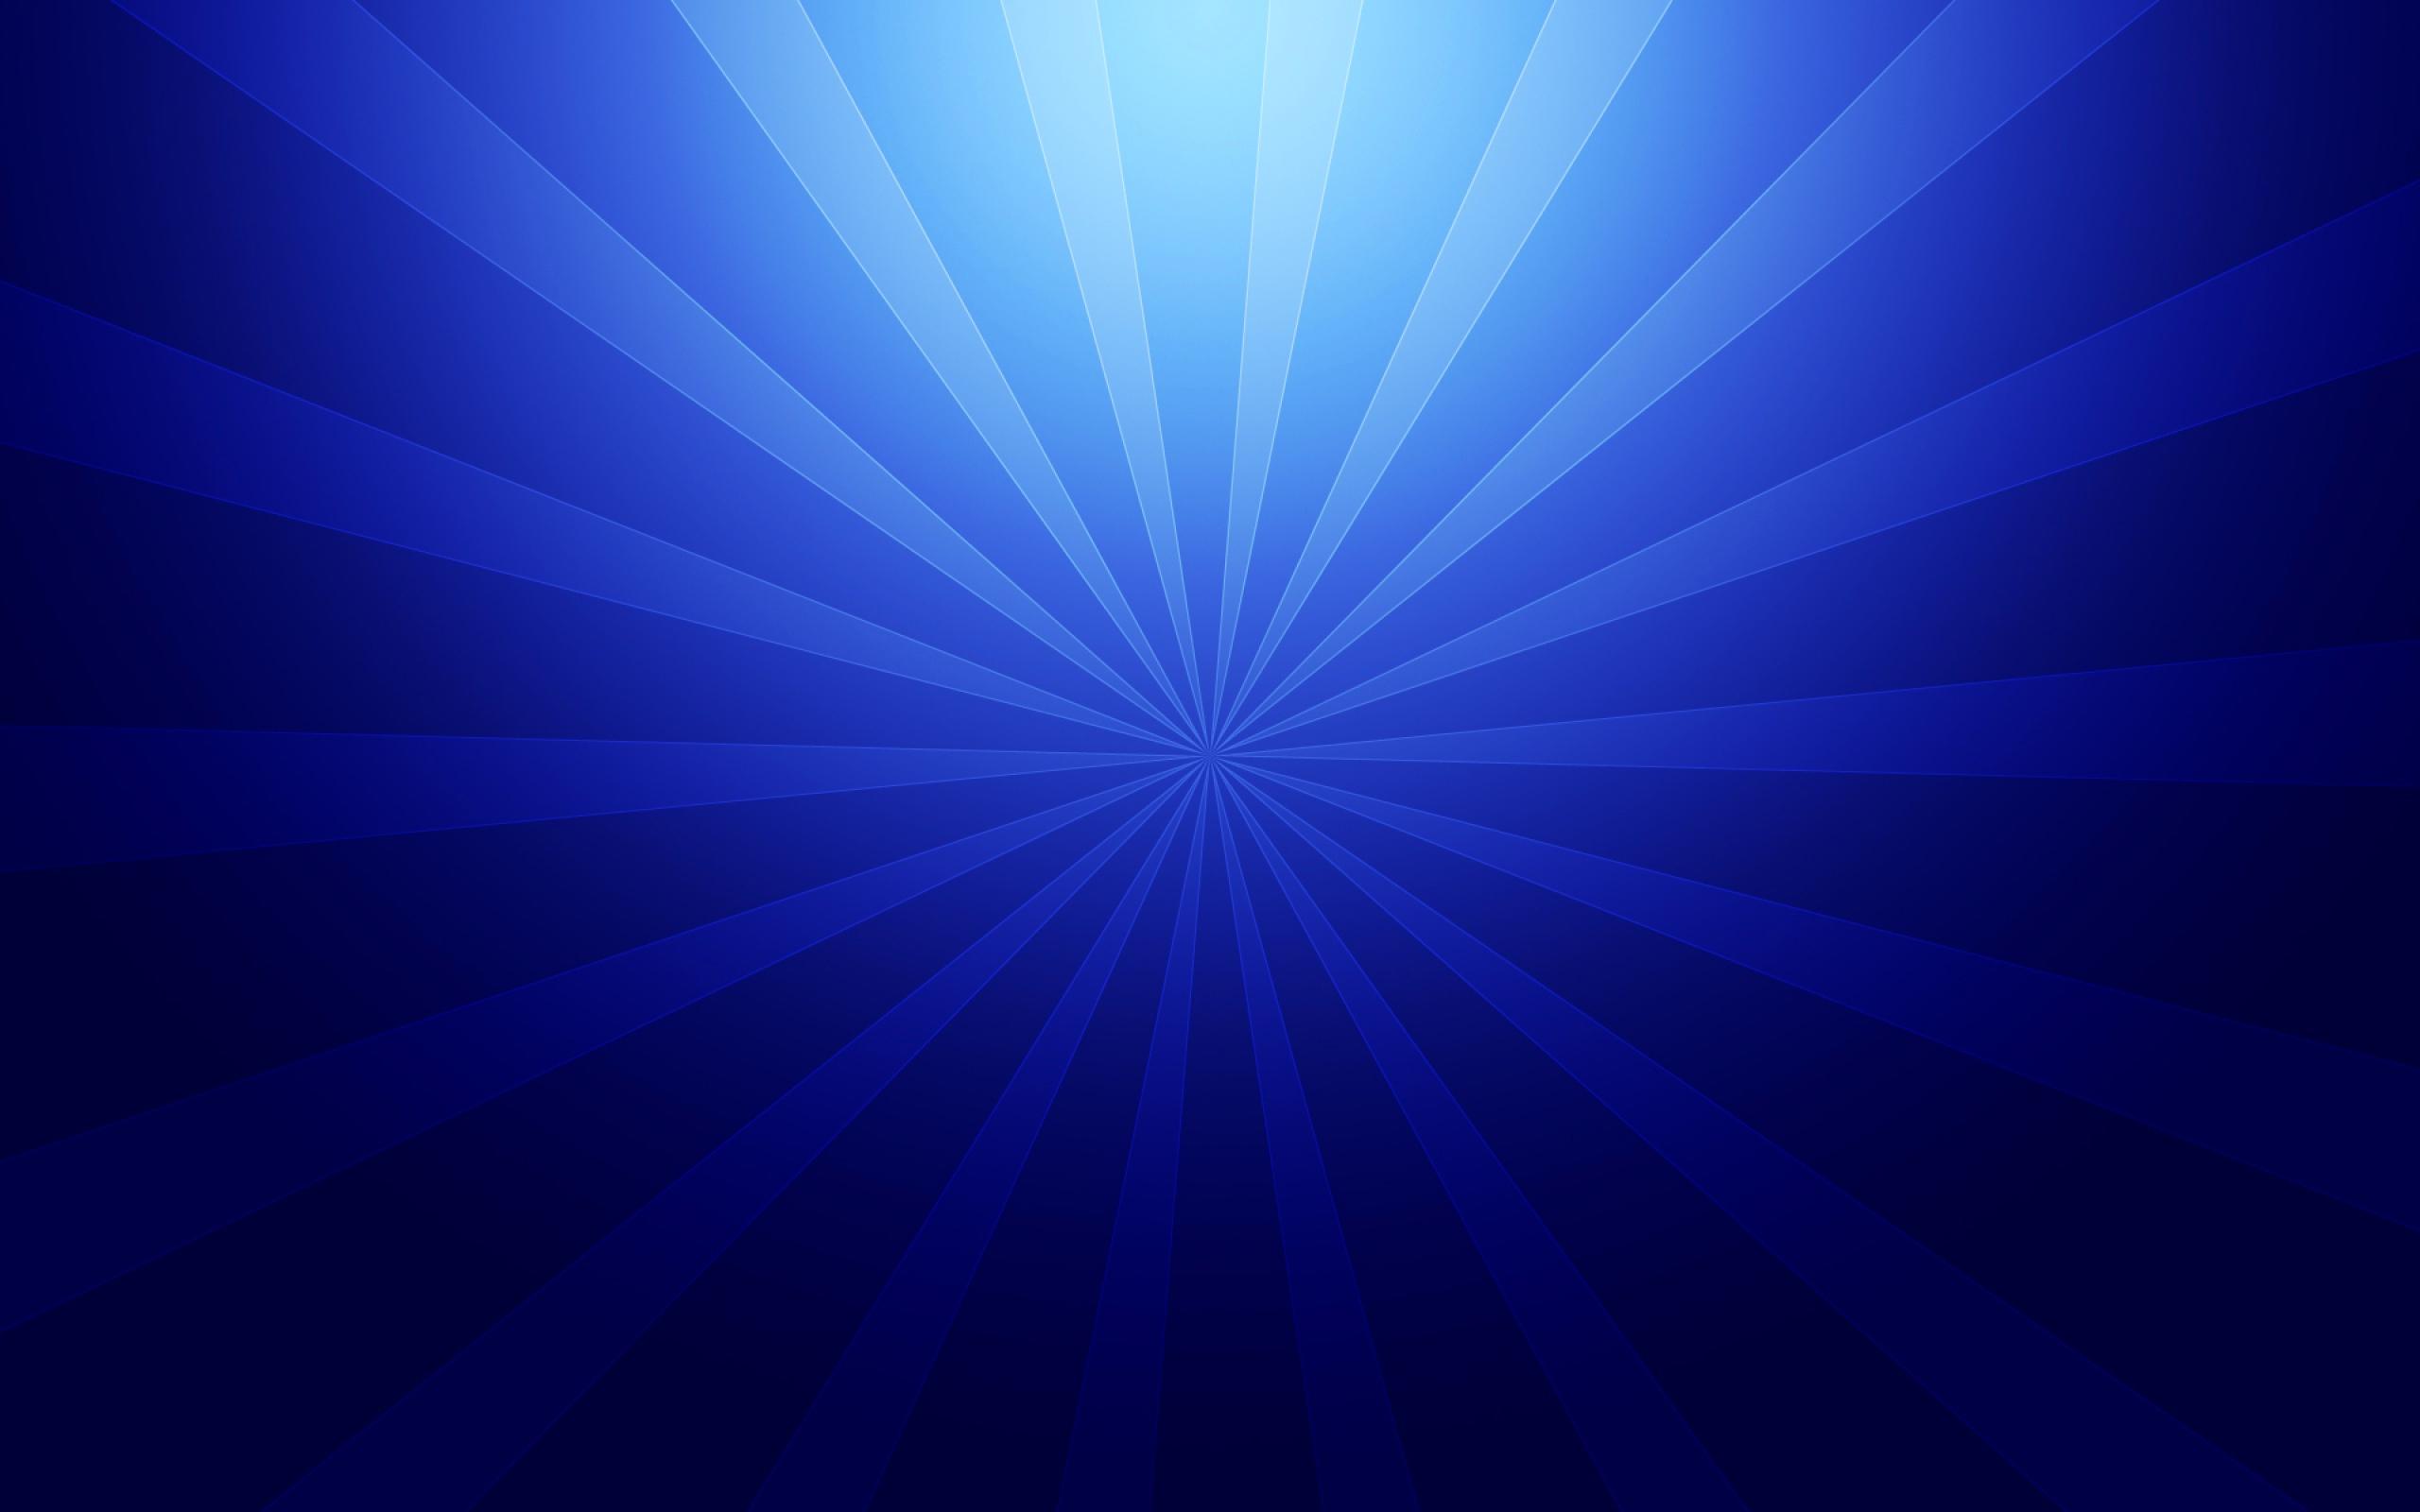 Fonds d 39 cran abstrait bleu maximumwall for Fond ecran smartphone full hd